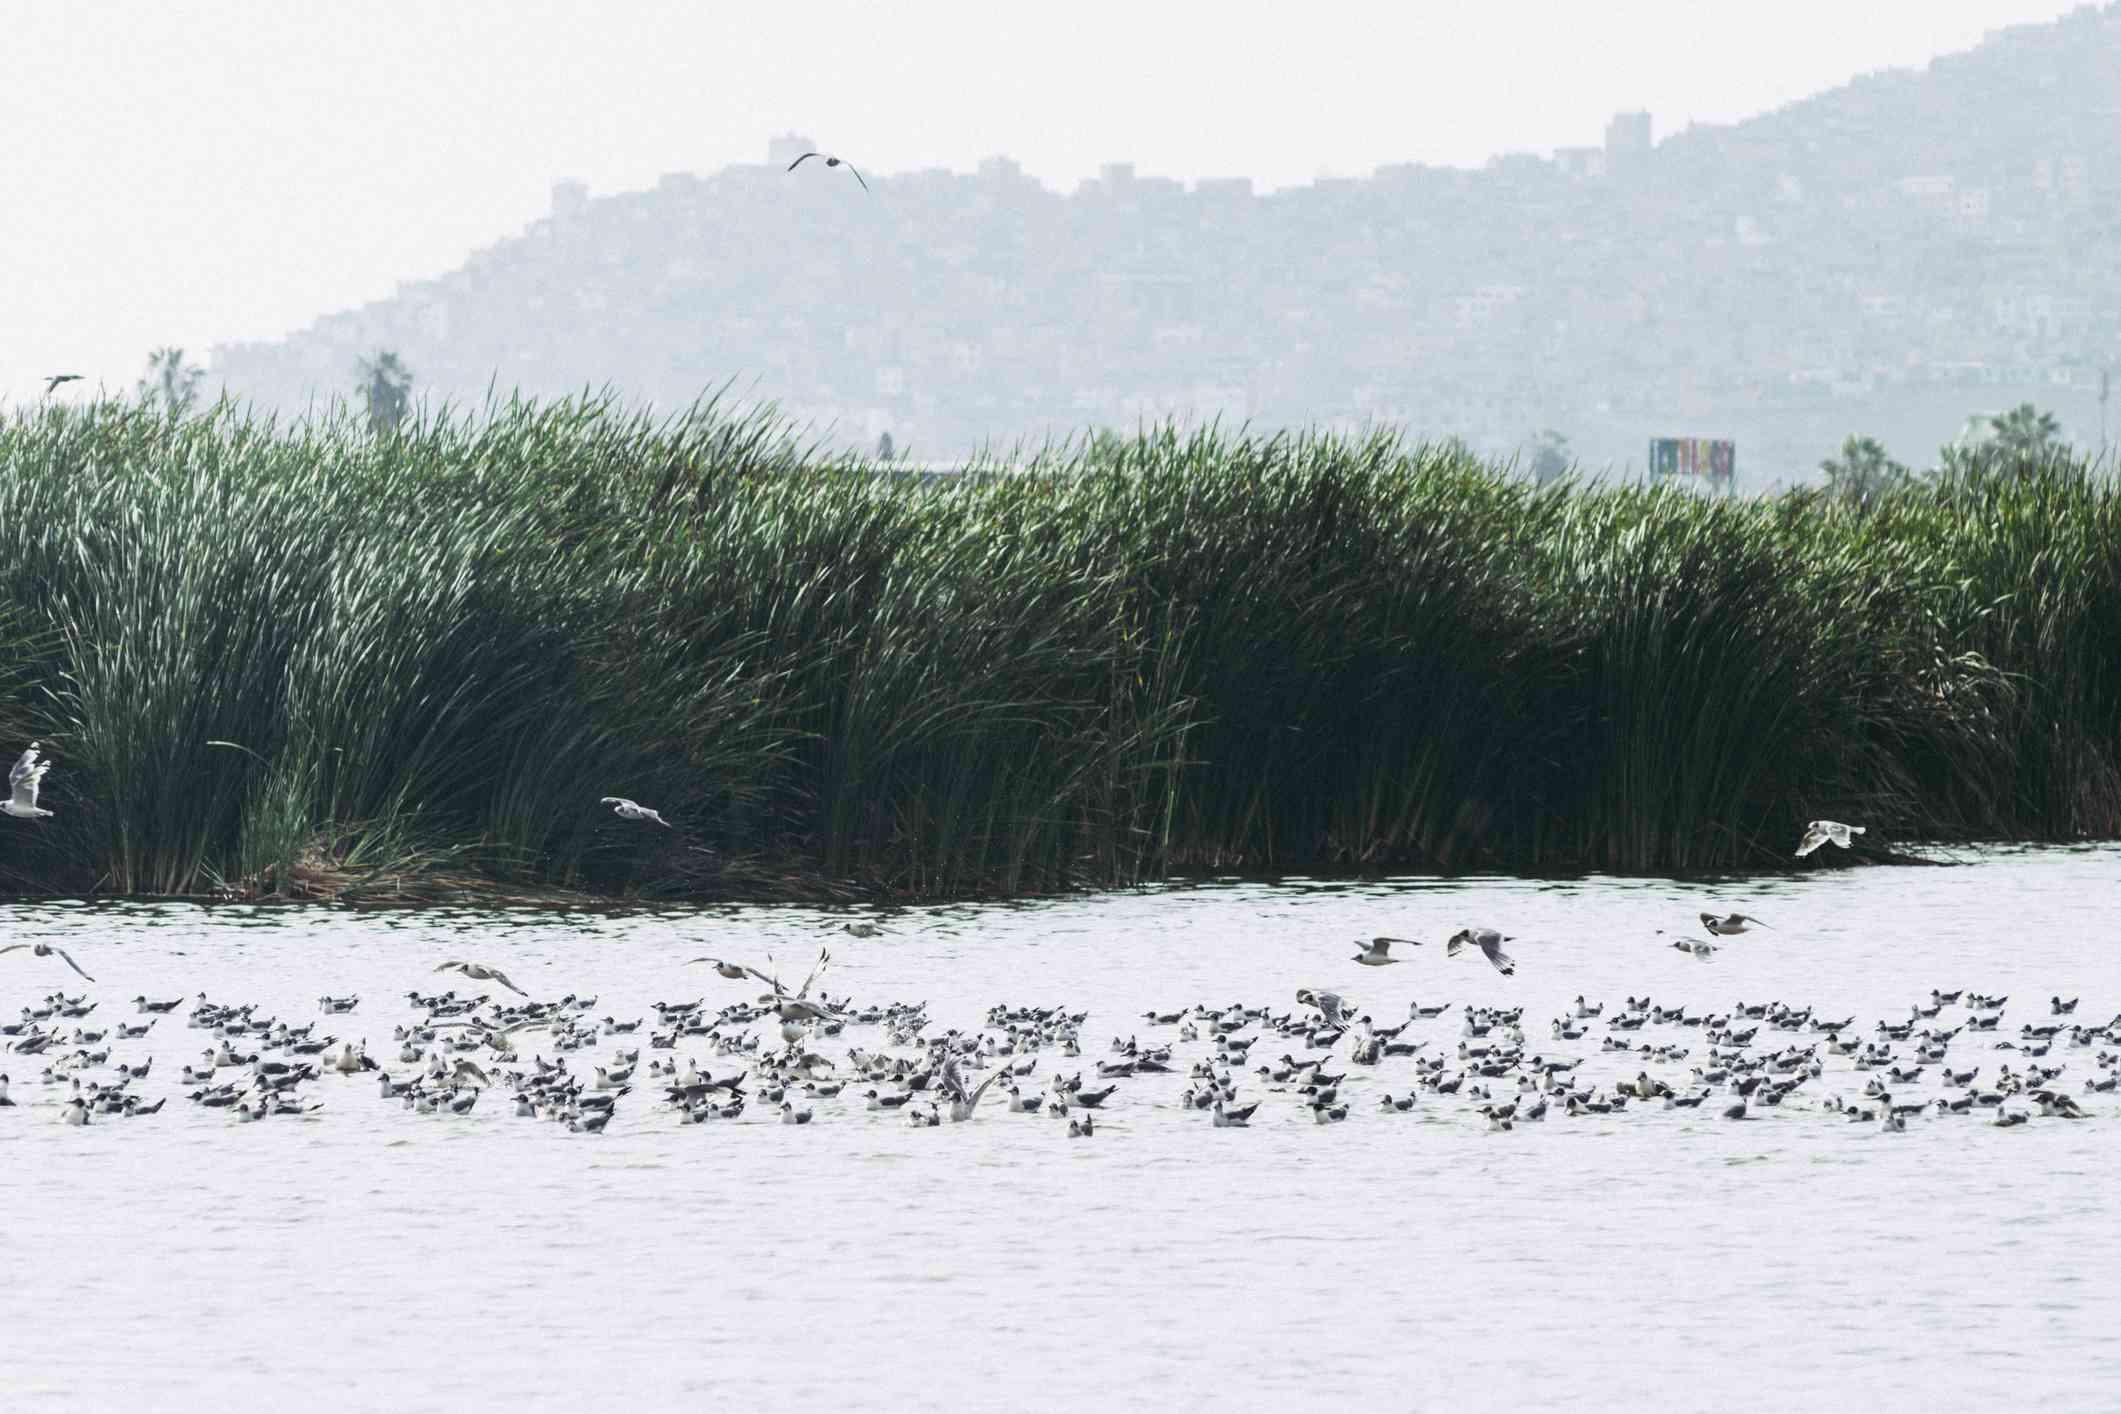 Birds in the Pantanos de Villa (Swamp of Villa), Chorrillos, Lima Peru.